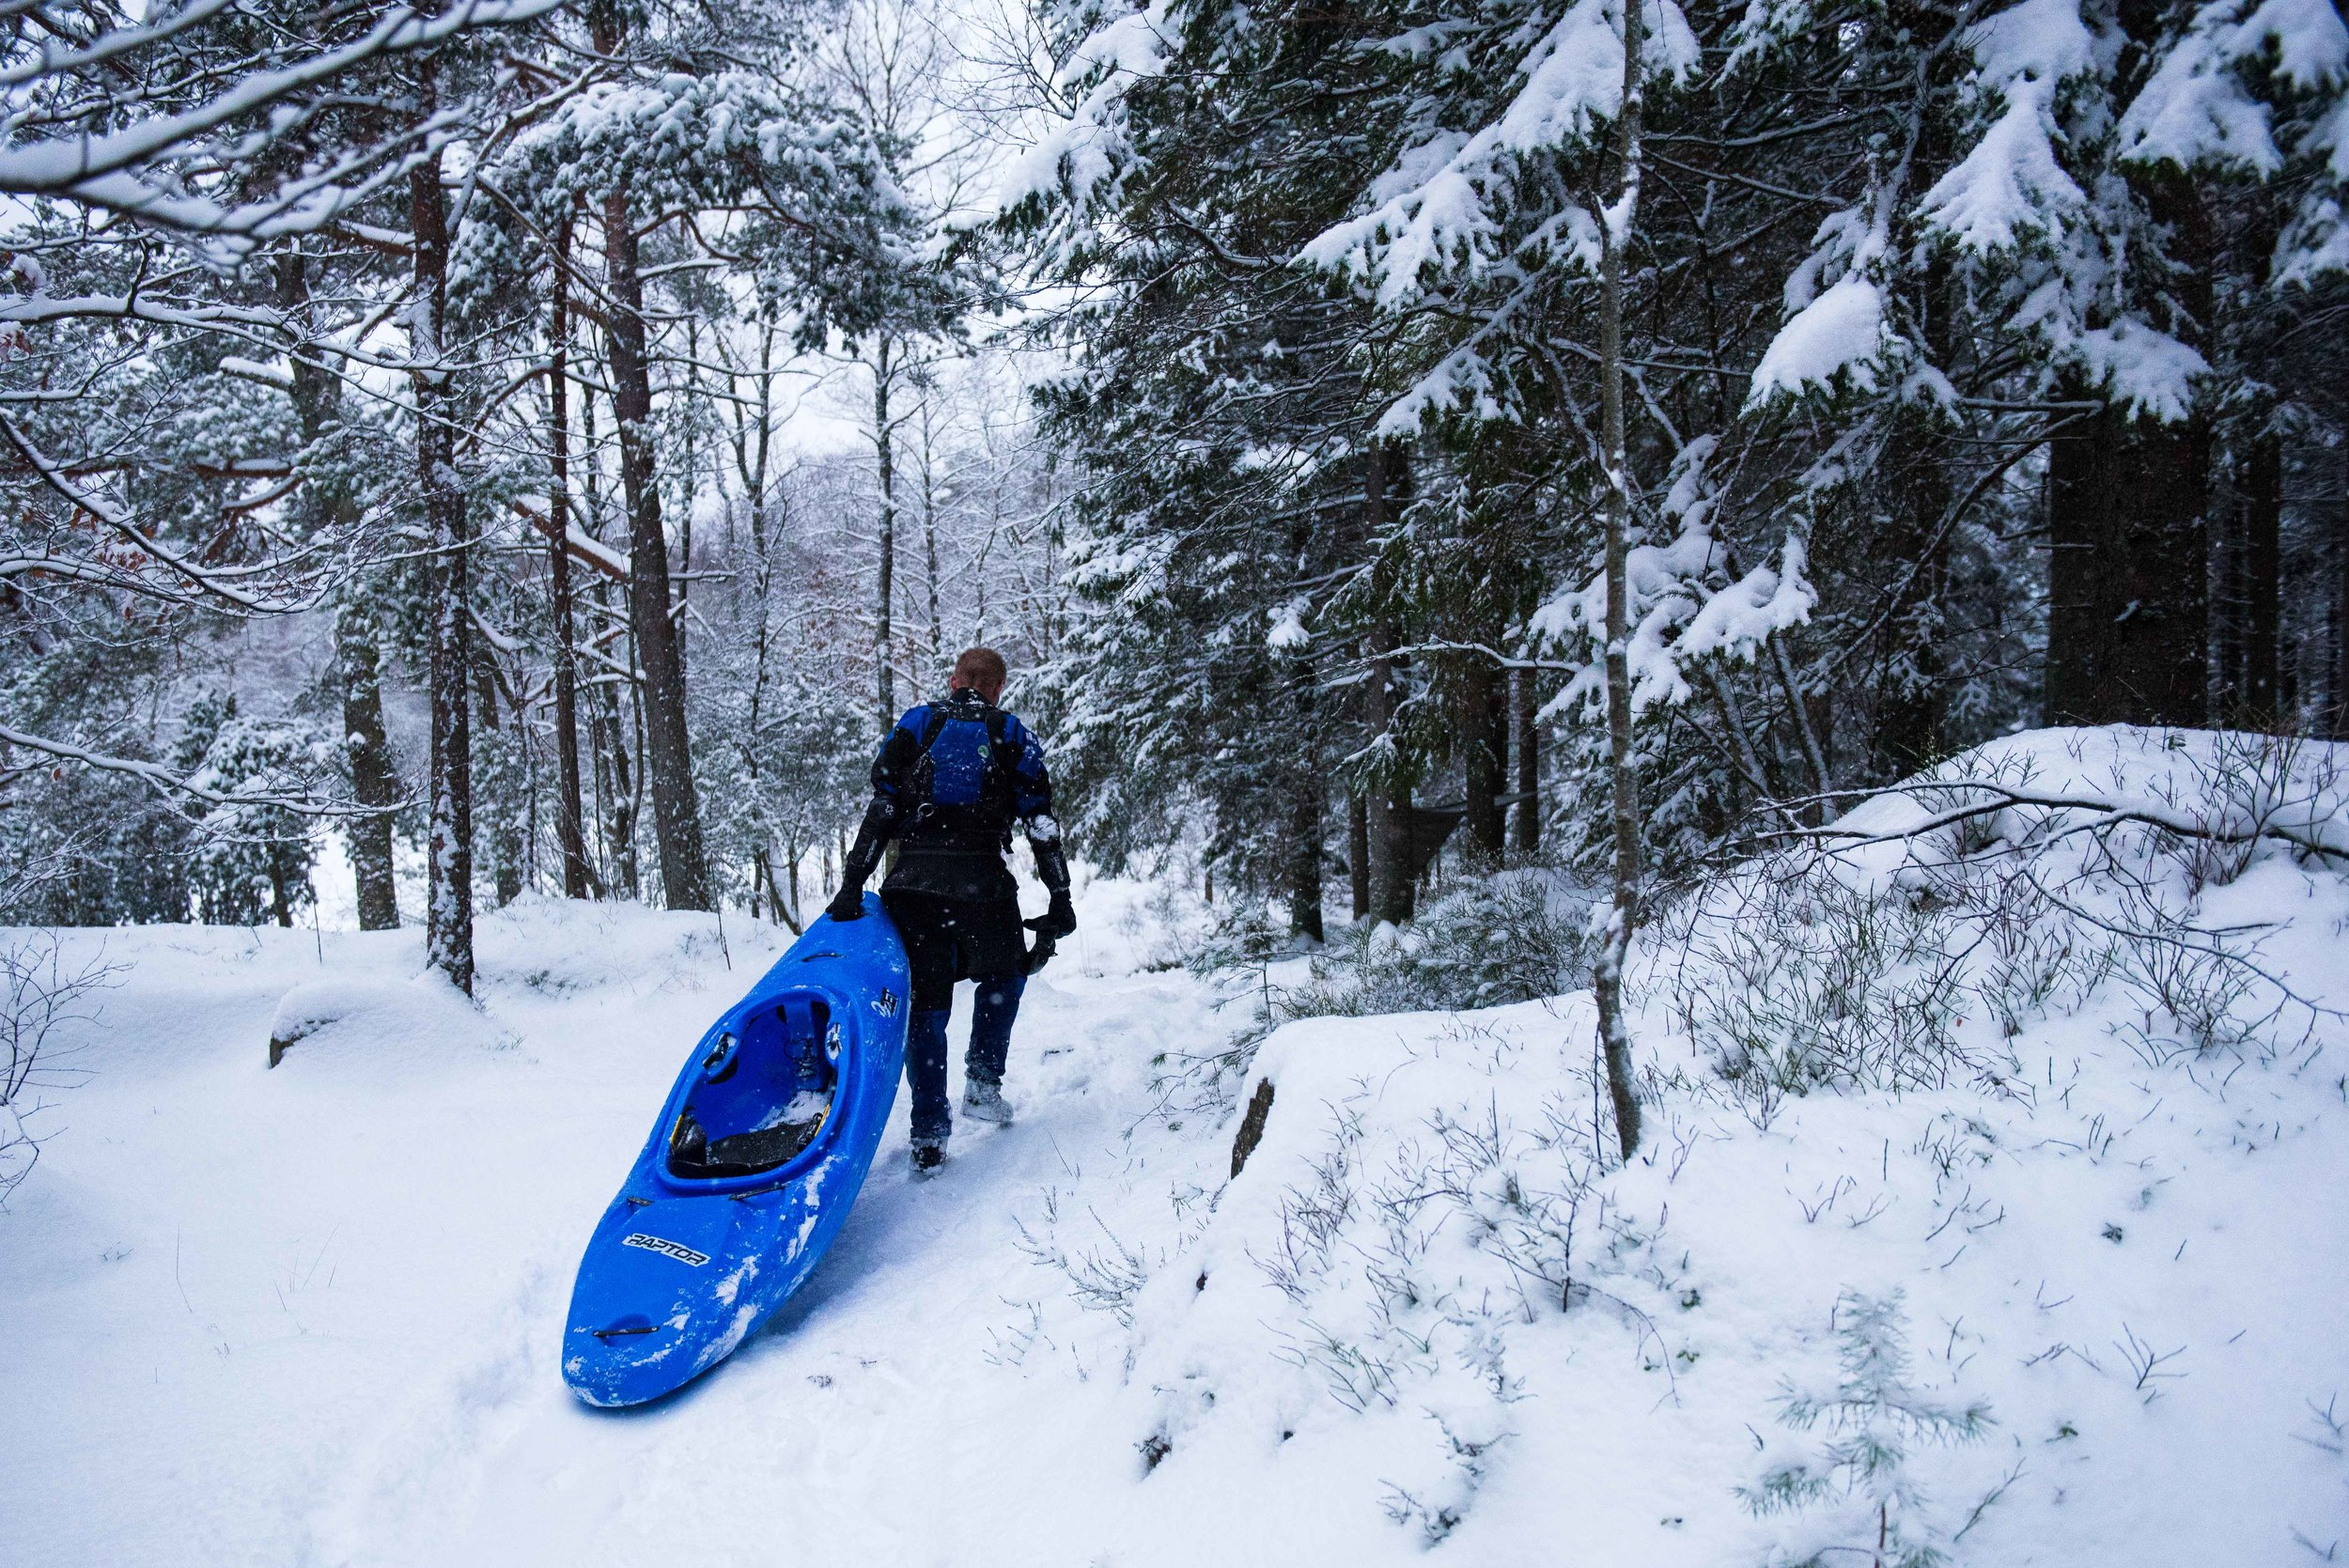 redbull-illume-submission-gustav-thuesen-photographer-fotograf-video-photo-foto-action-sports-adventure-travel-7.jpg